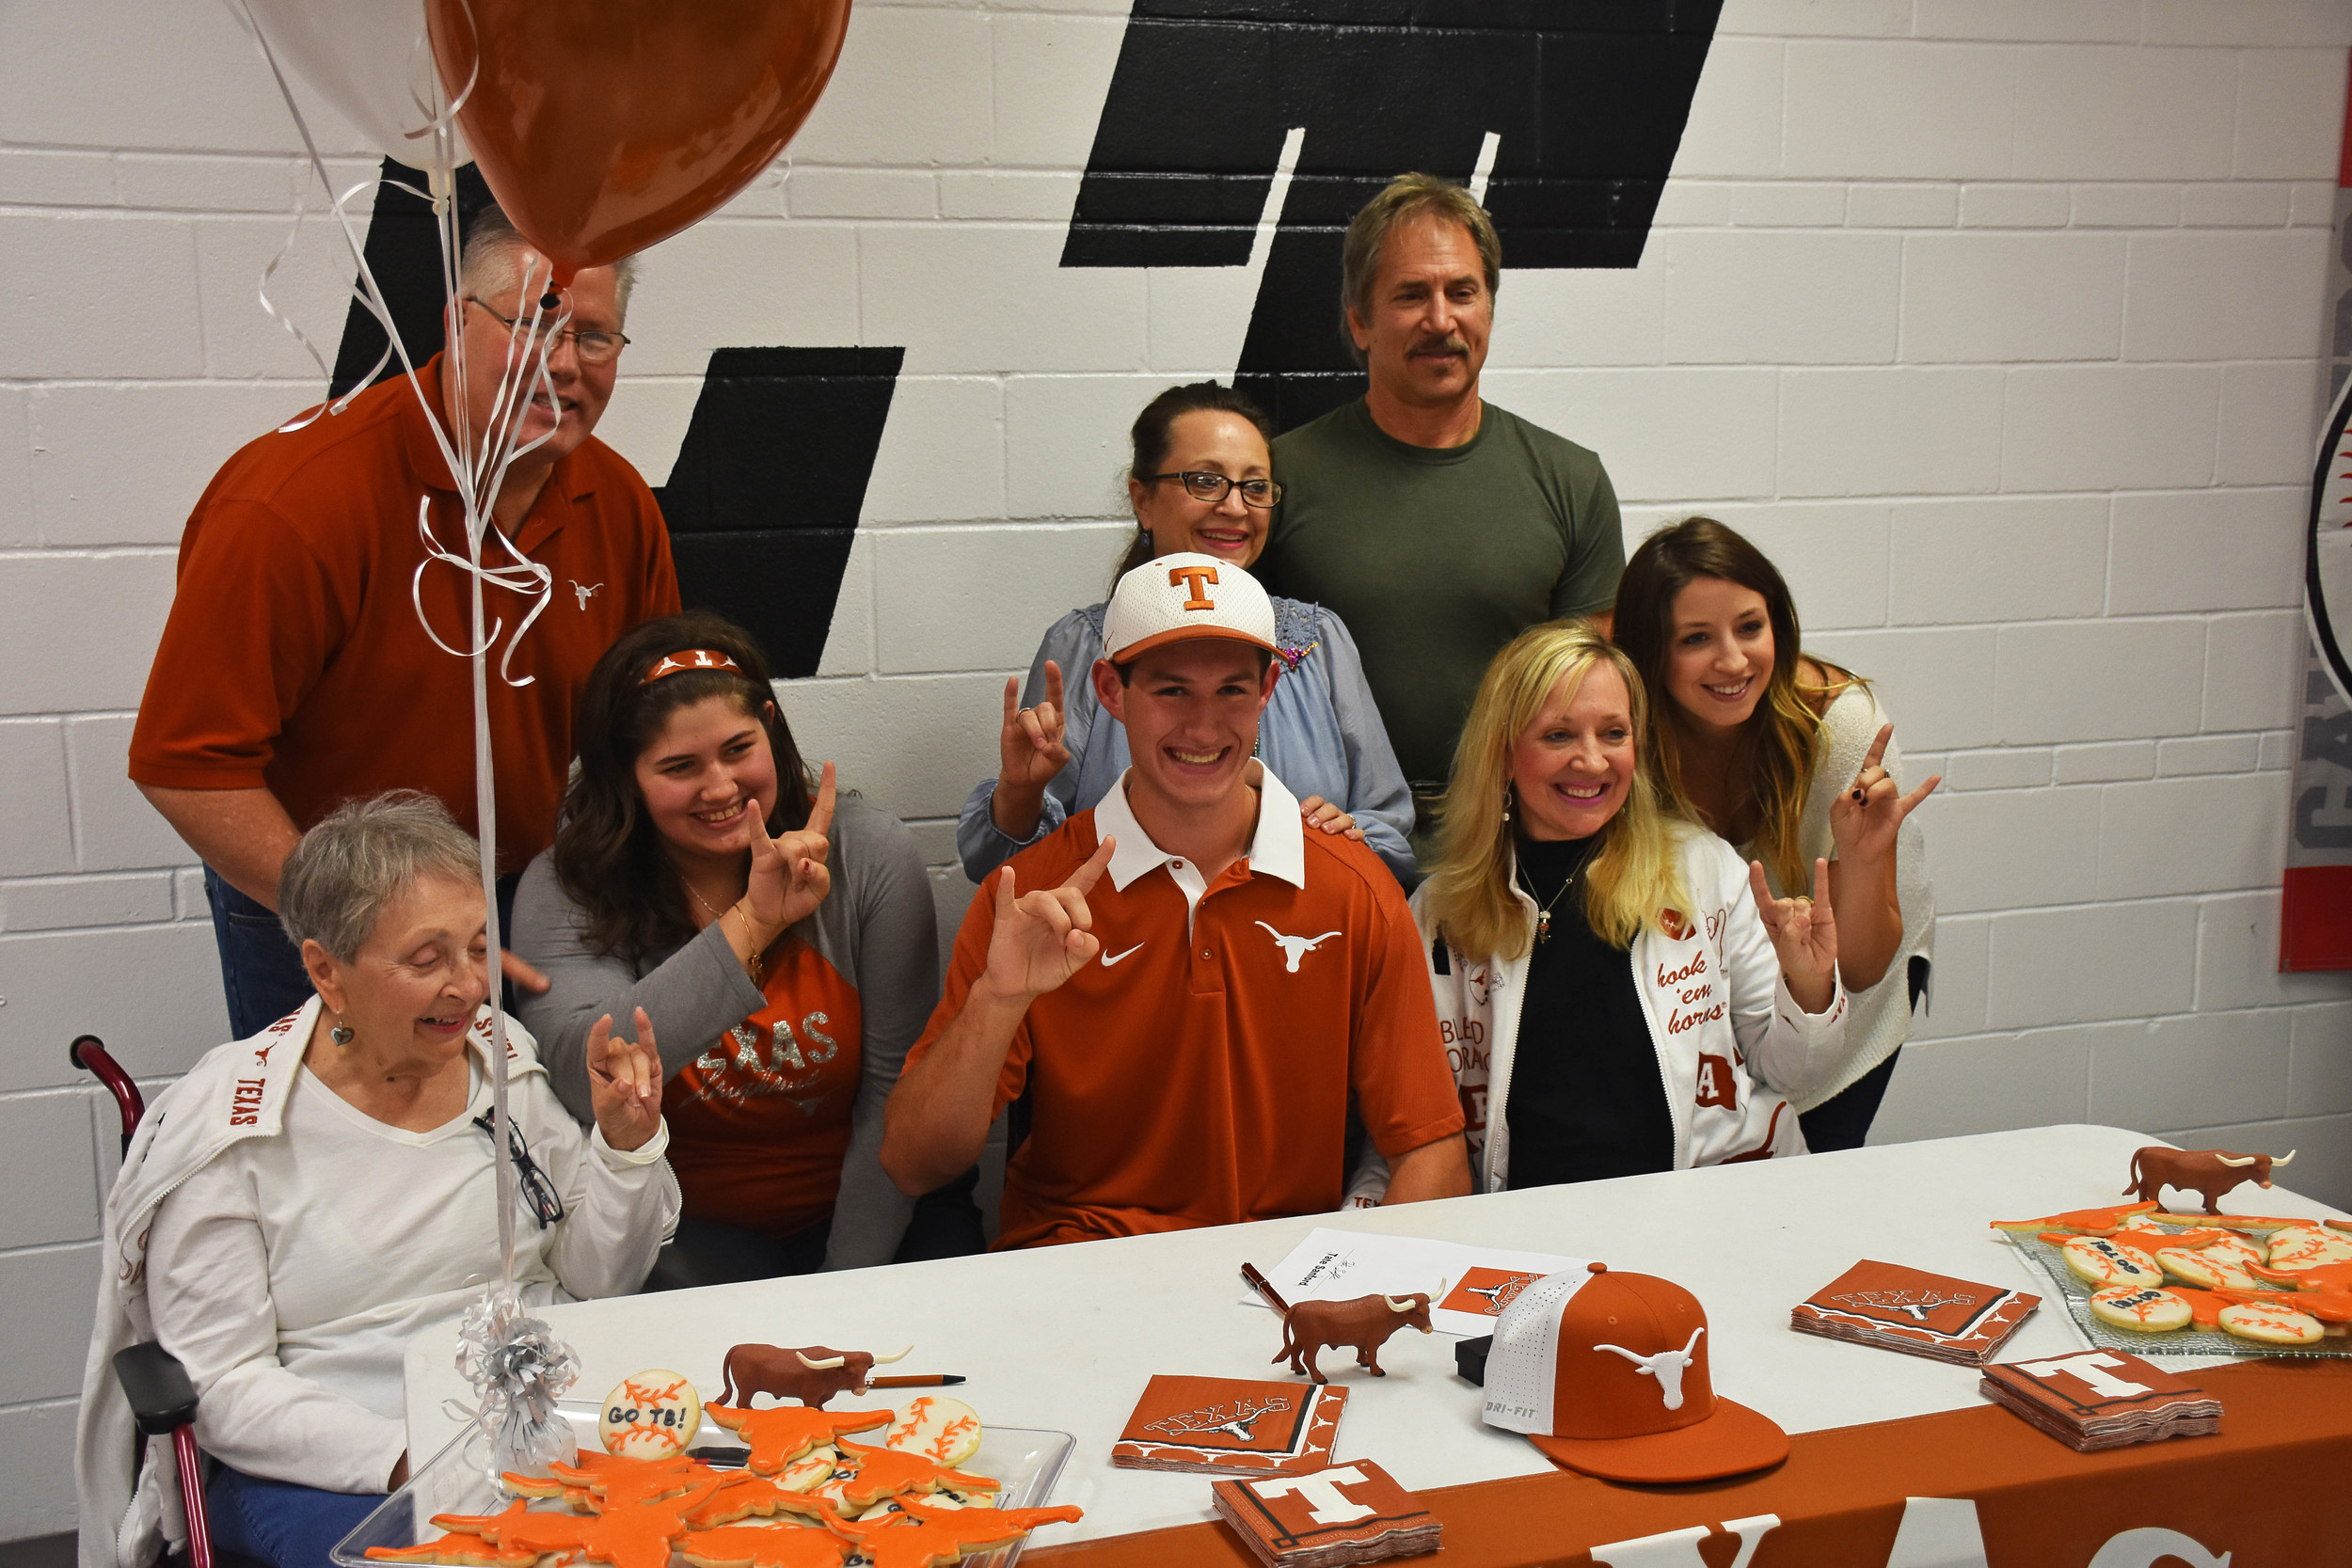 Tate Sandford - Baseball - University of Texas